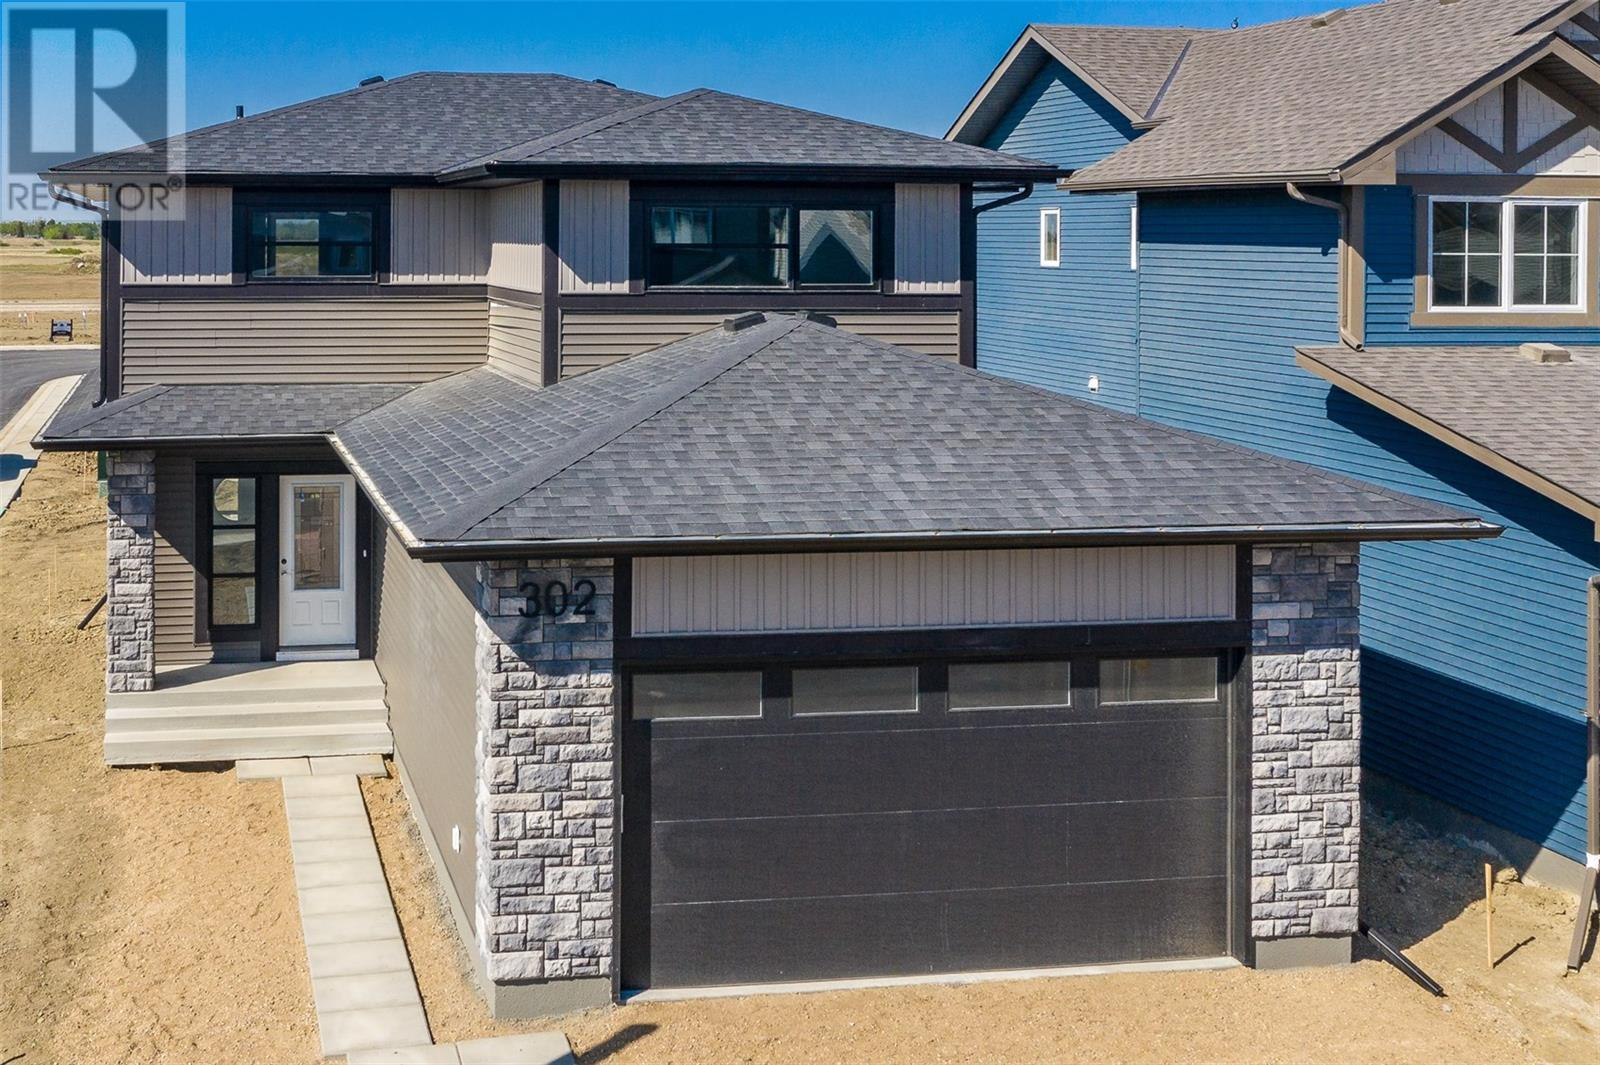 Removed: 302 Germain Mnr, Saskatoon, SK - Removed on 2020-01-16 10:22:07